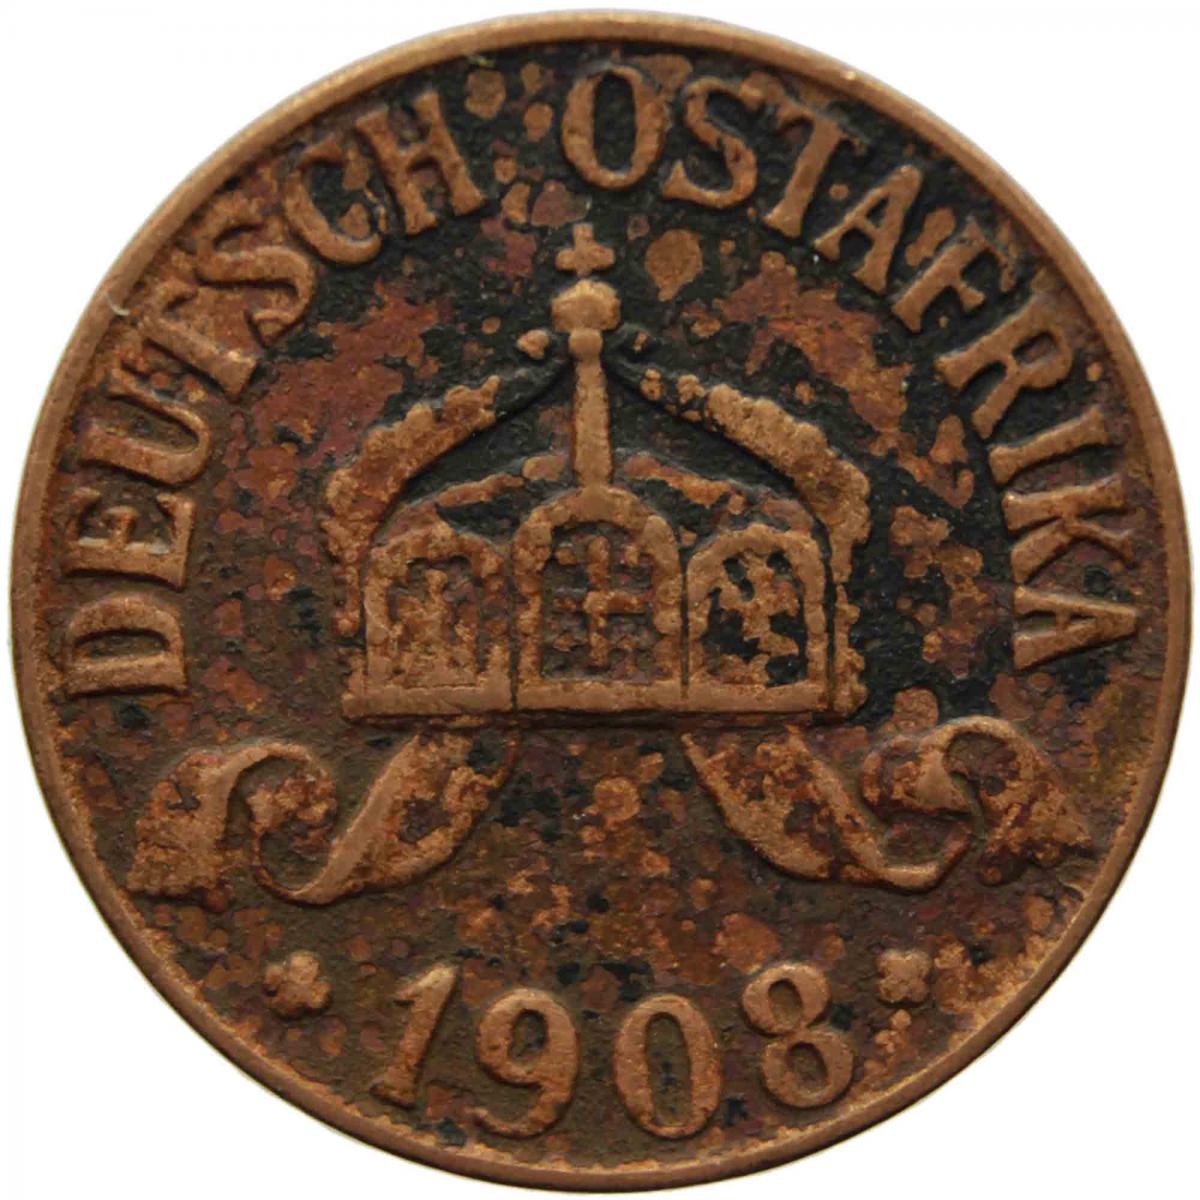 africa ostdeutschland 1908 coin